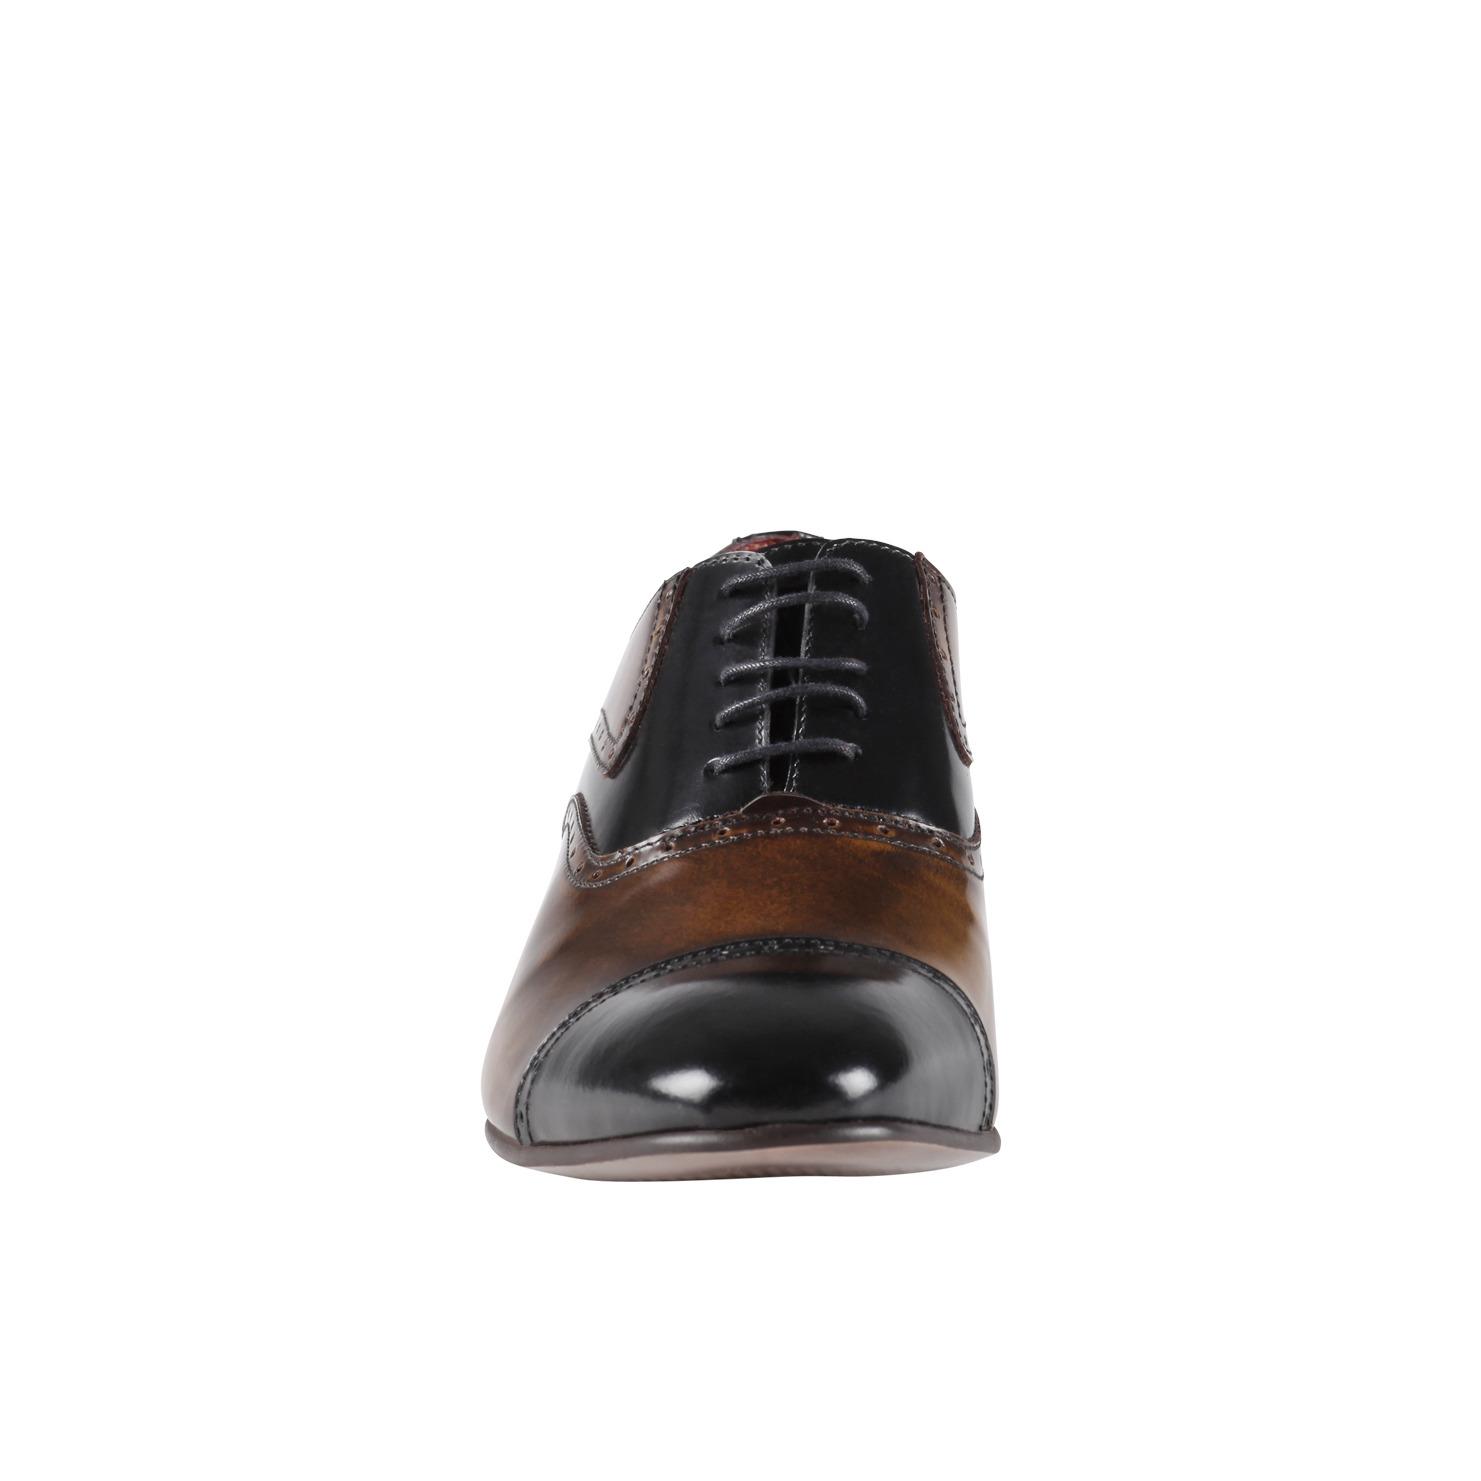 ALDO Helouri in Dark Brown (Brown) for Men